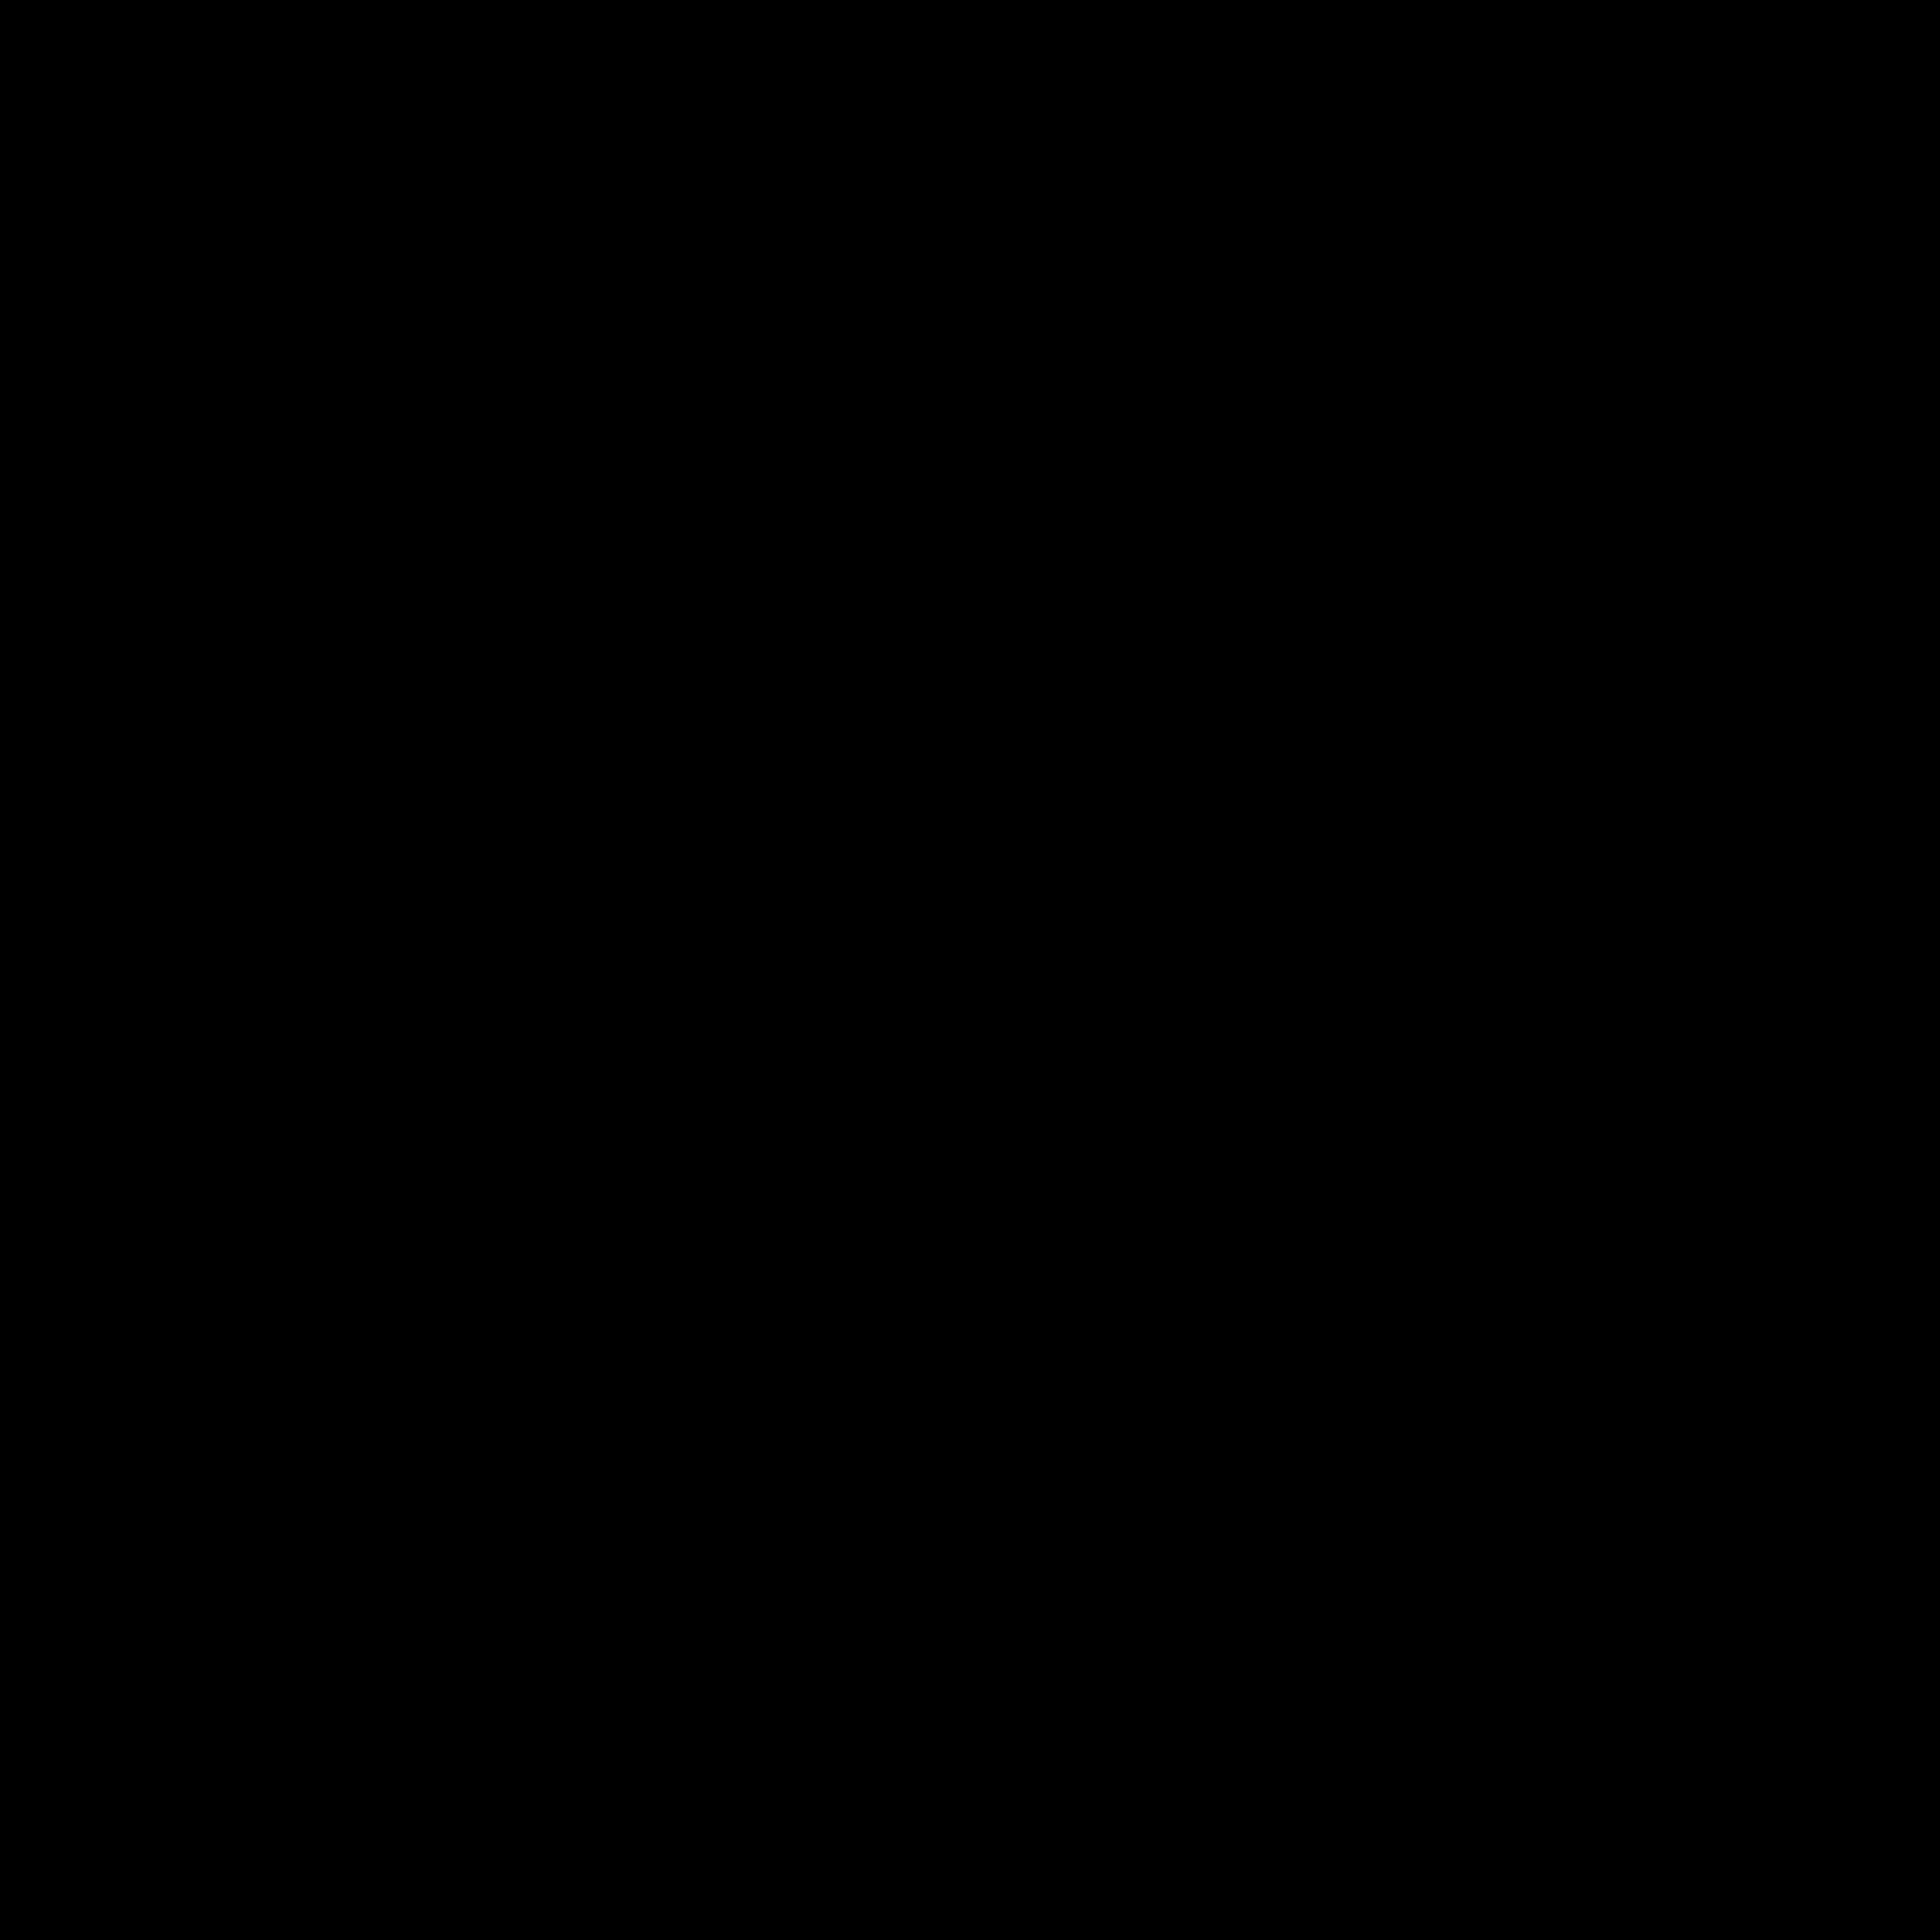 Universal information symbol